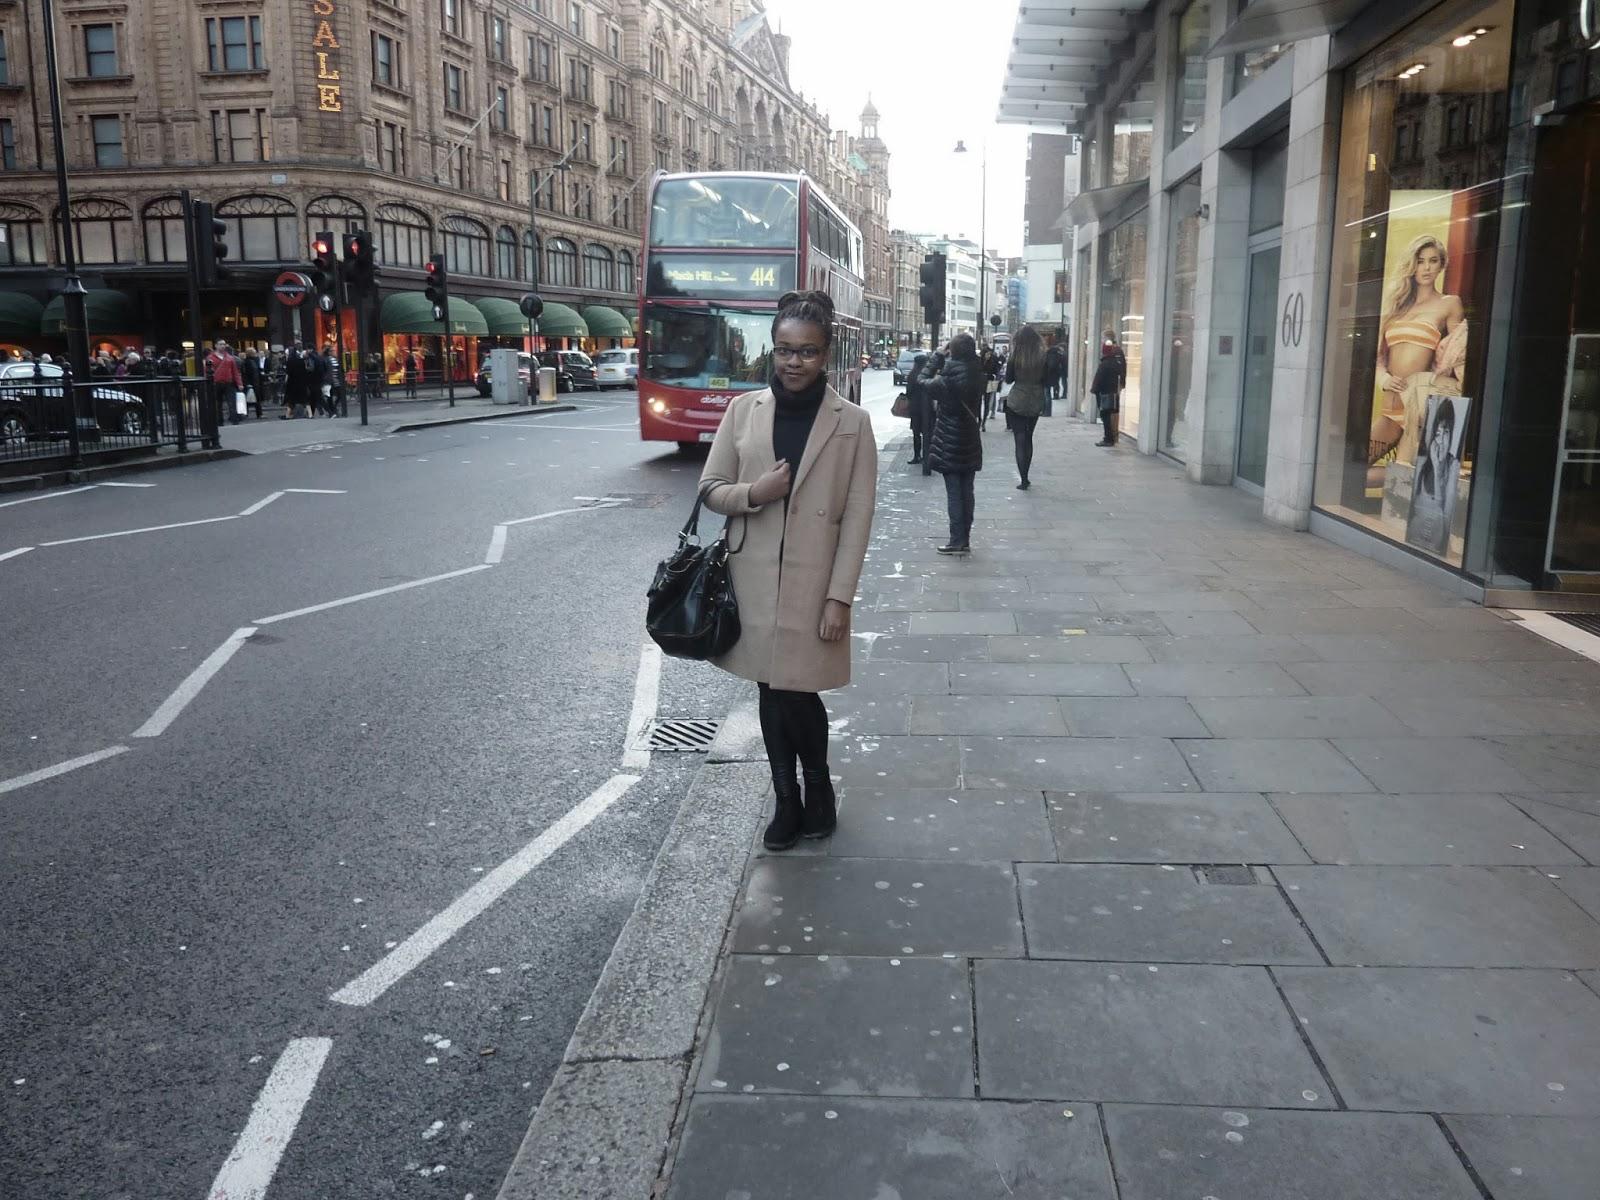 London Knightsbridge Harrods Shopping Red Bus H&M Camel Coat Like Kim Kardashian